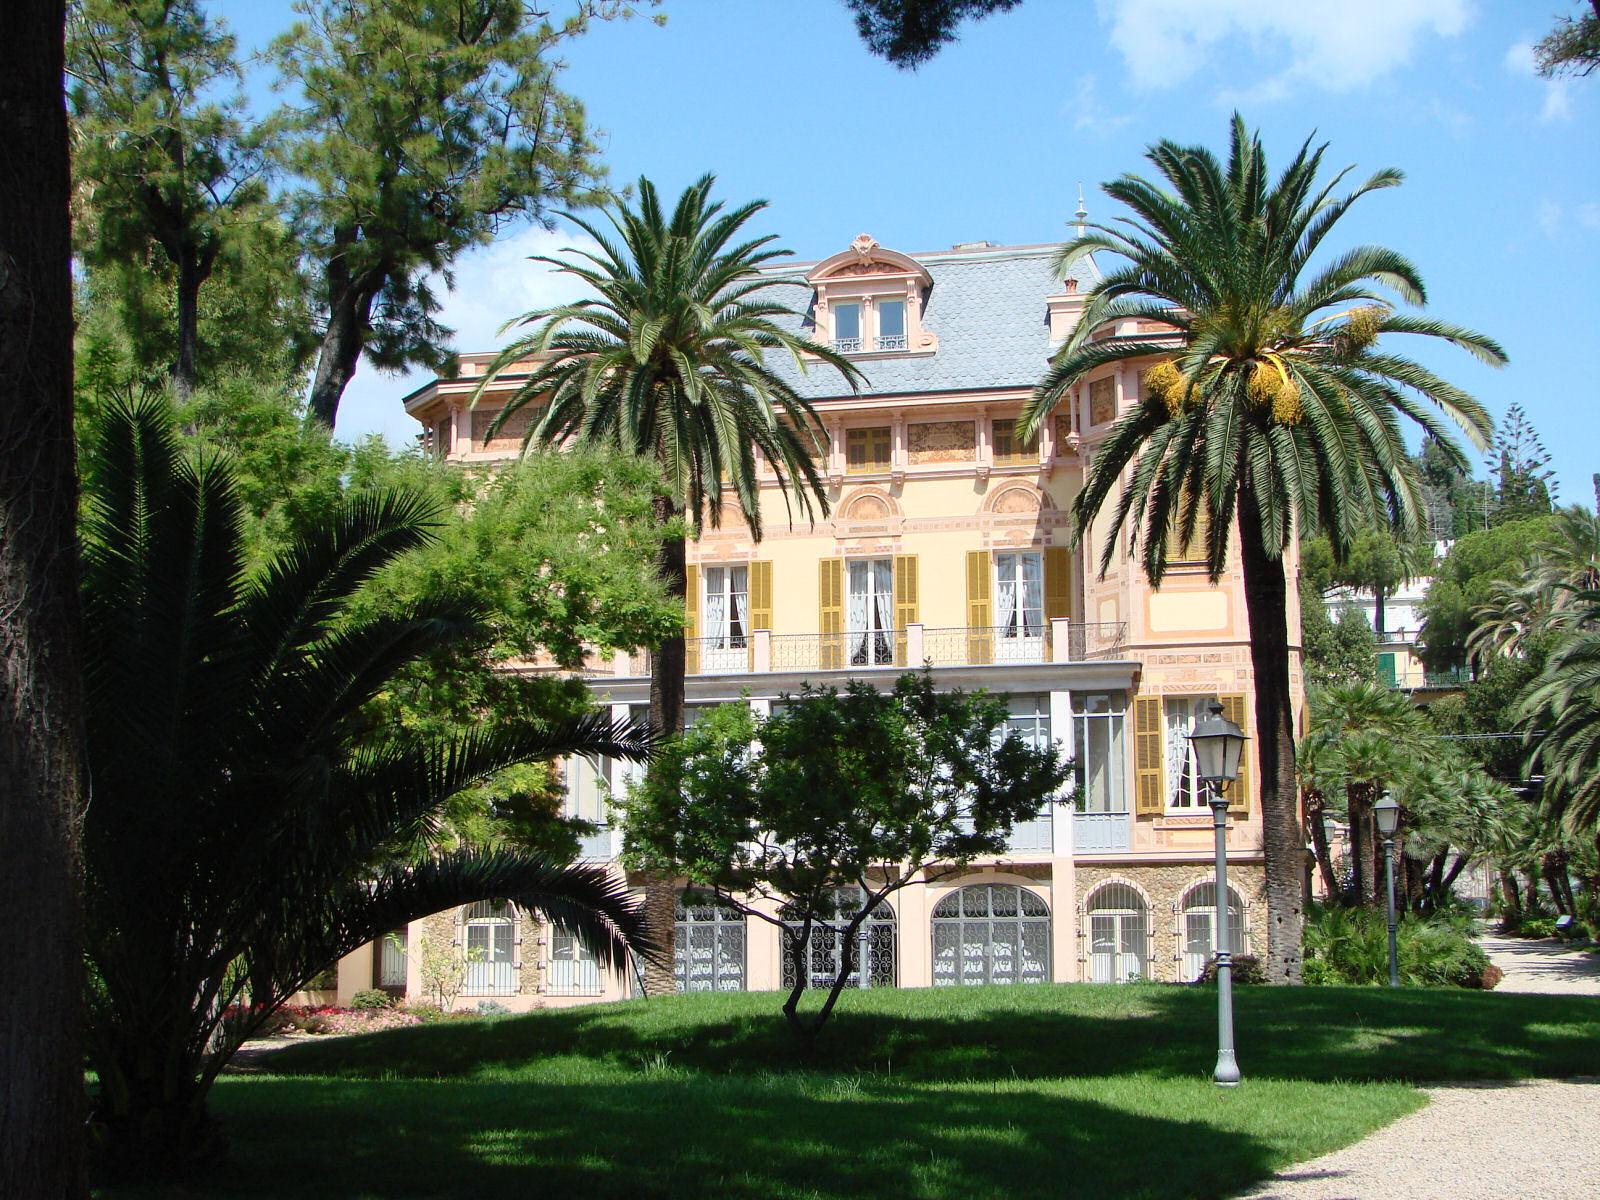 San Remo Villa Apartment Homes Irvine